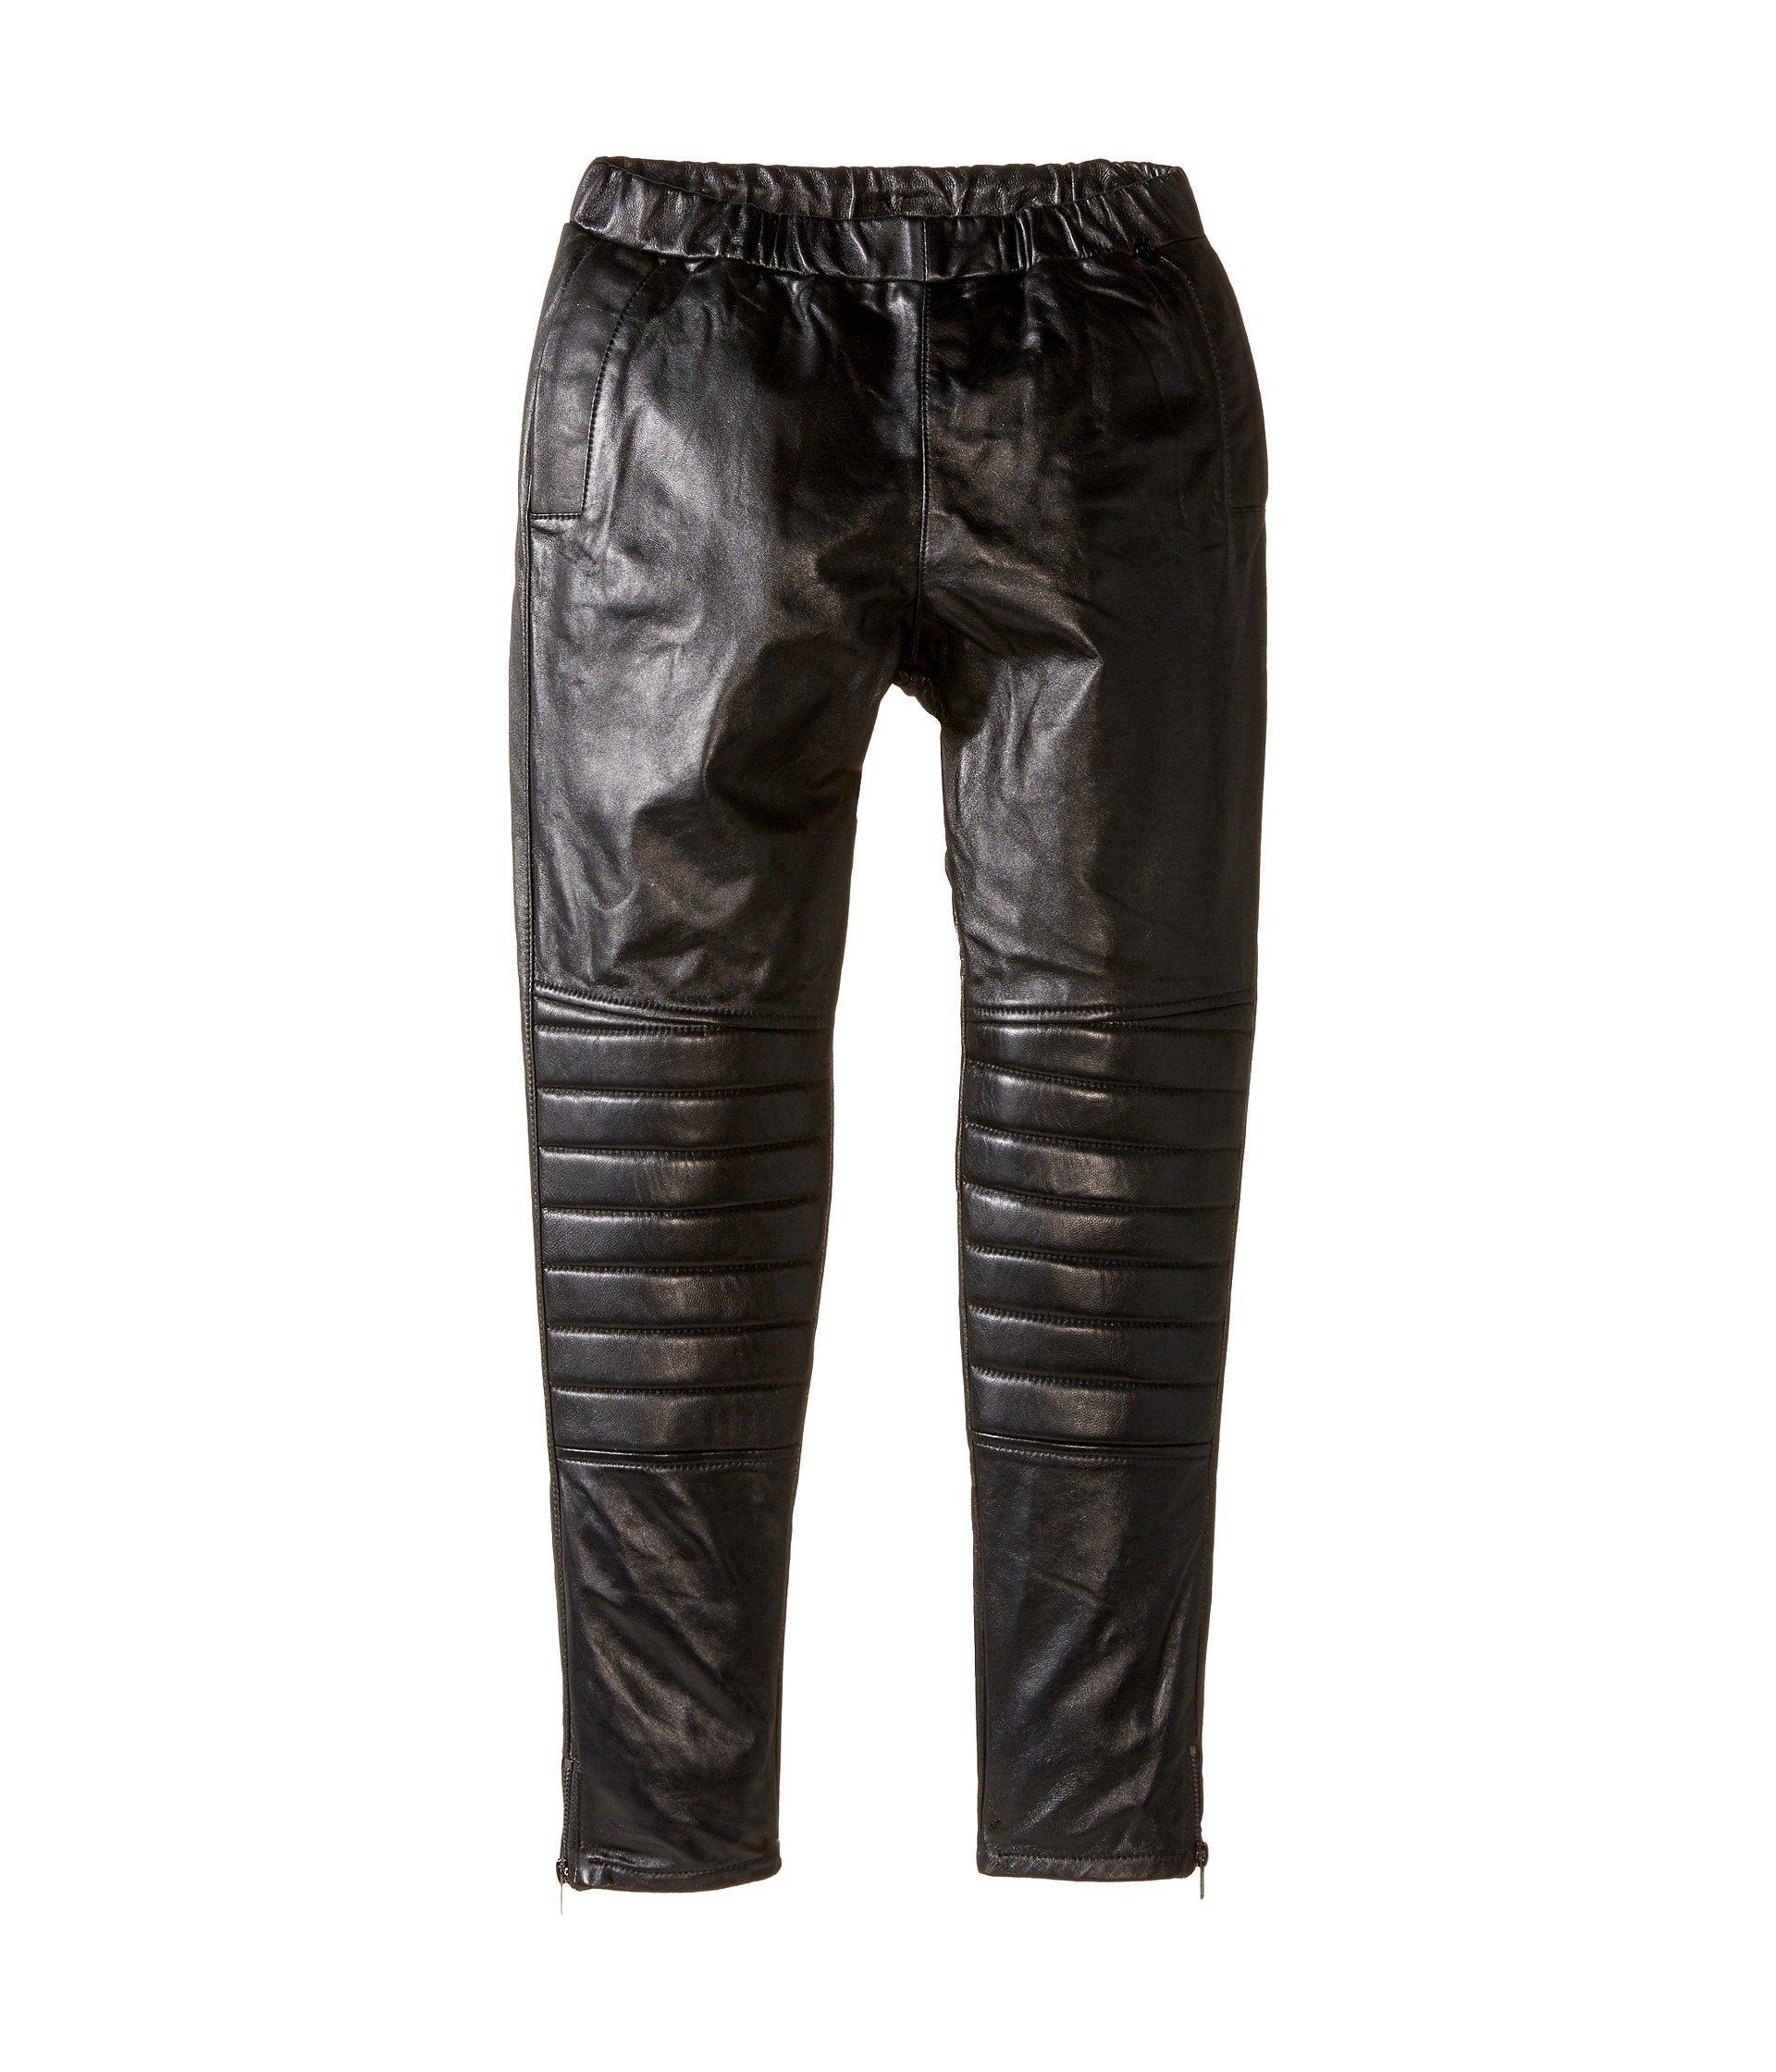 Unisex Leather Harem Pants (Little Kids/Big Kids) Black 9 Big Kids X One Size